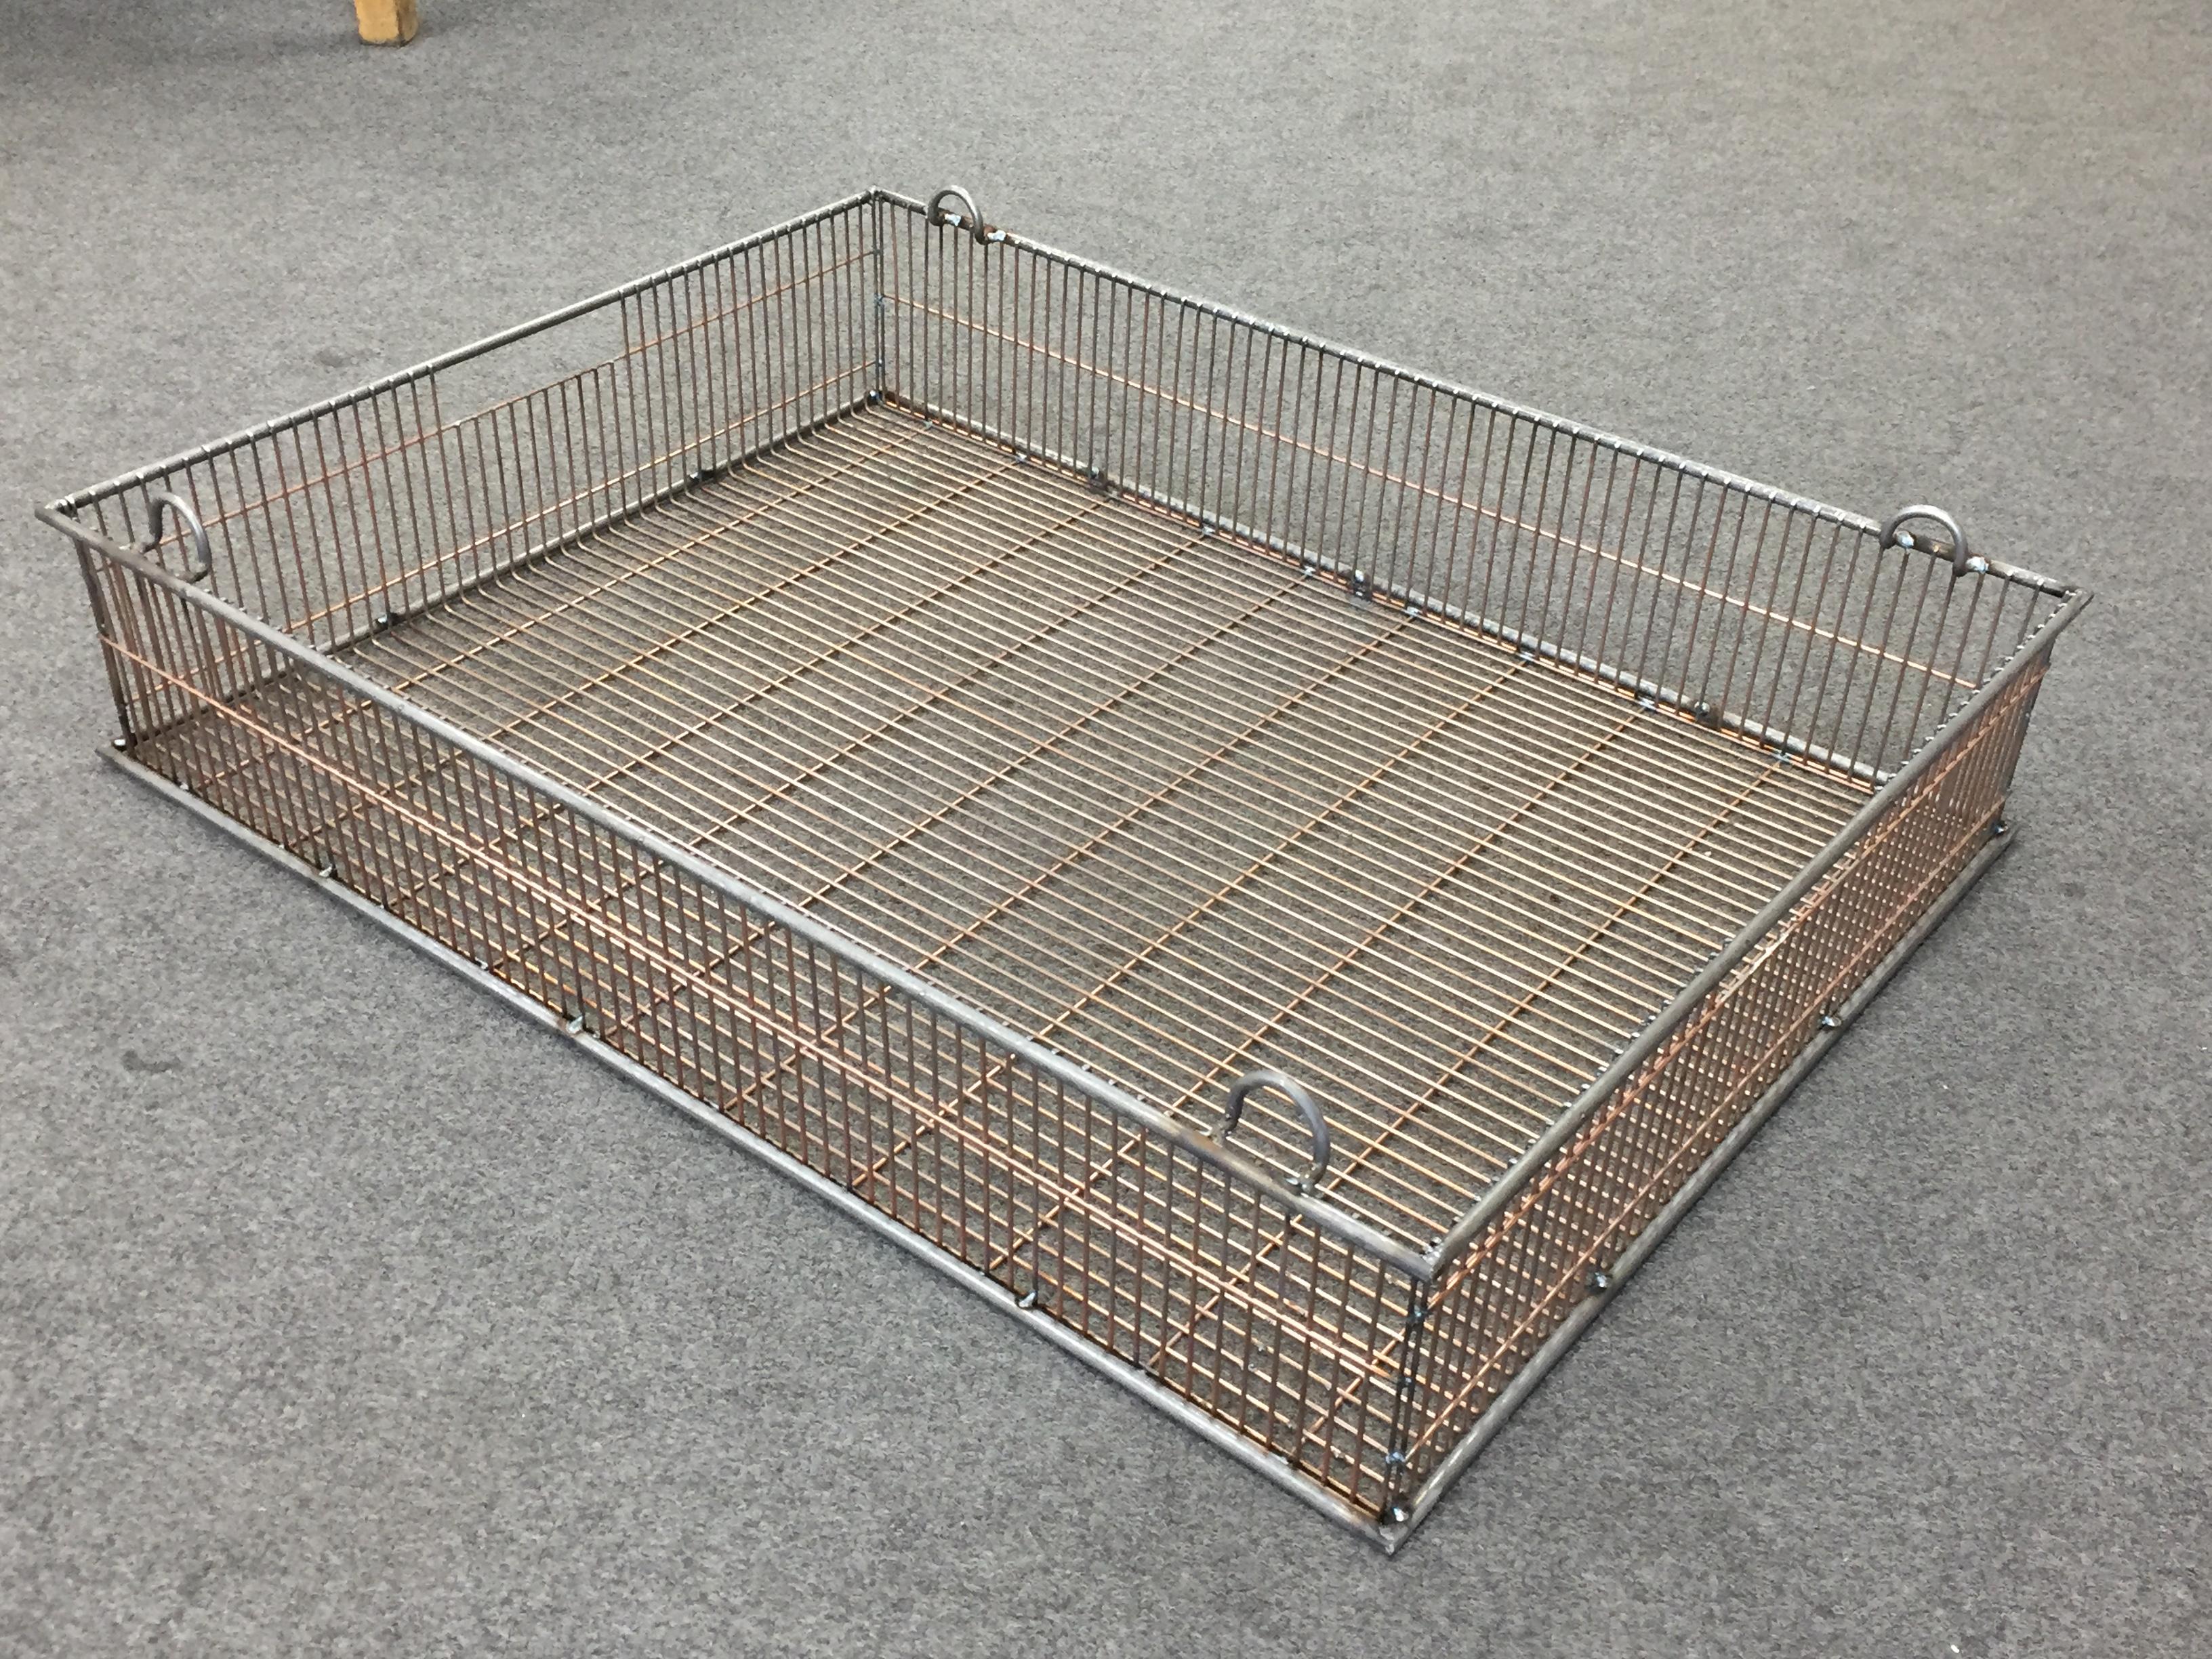 Prototype conveyor baskets